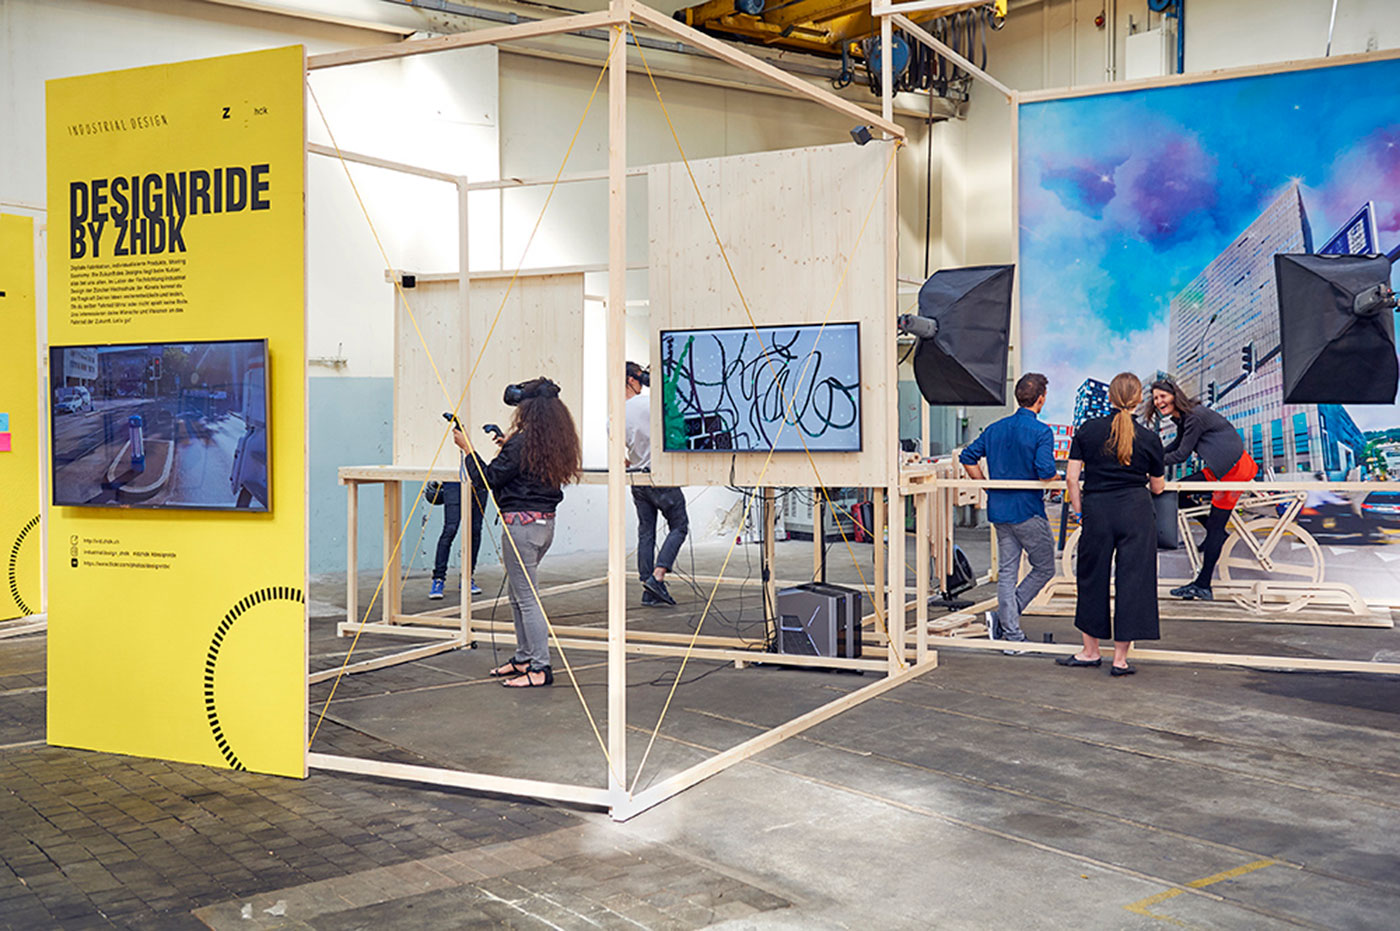 Design Biennale Zürich 2017, Design Ride, ZHdK, Industrial Design (Foto: Luca Zanier)